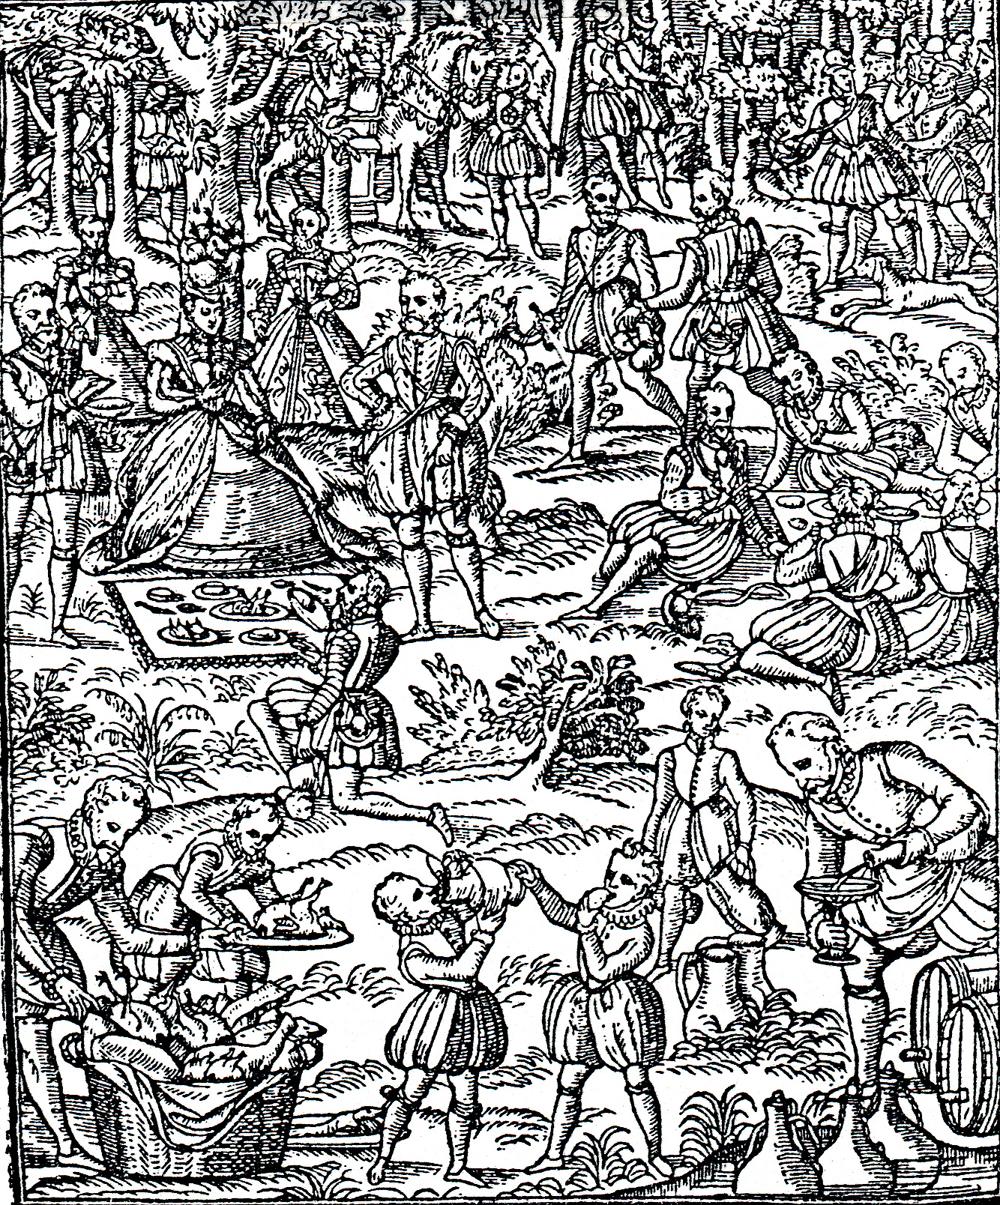 George Gascoigne's The Noble Arte of Venerie or Hunting (1575)